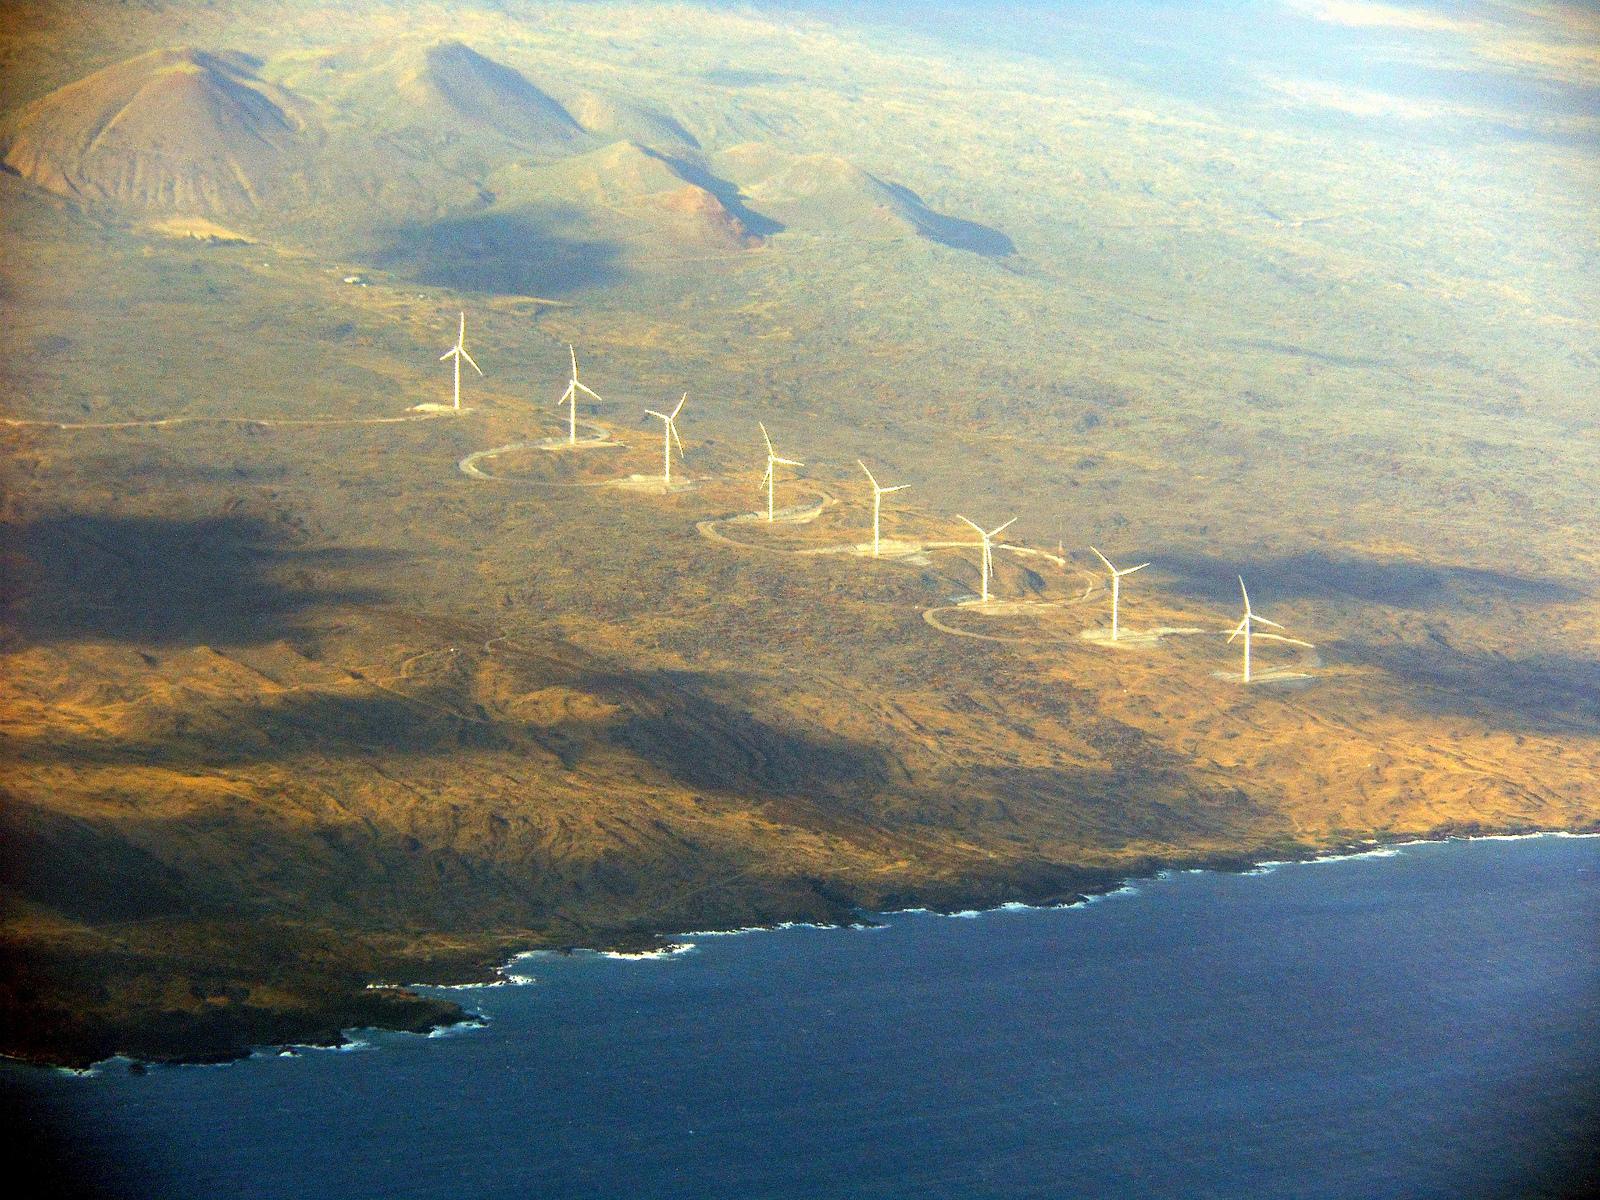 maui-wind-farm-by-Kahunapule-Michael-Johnson